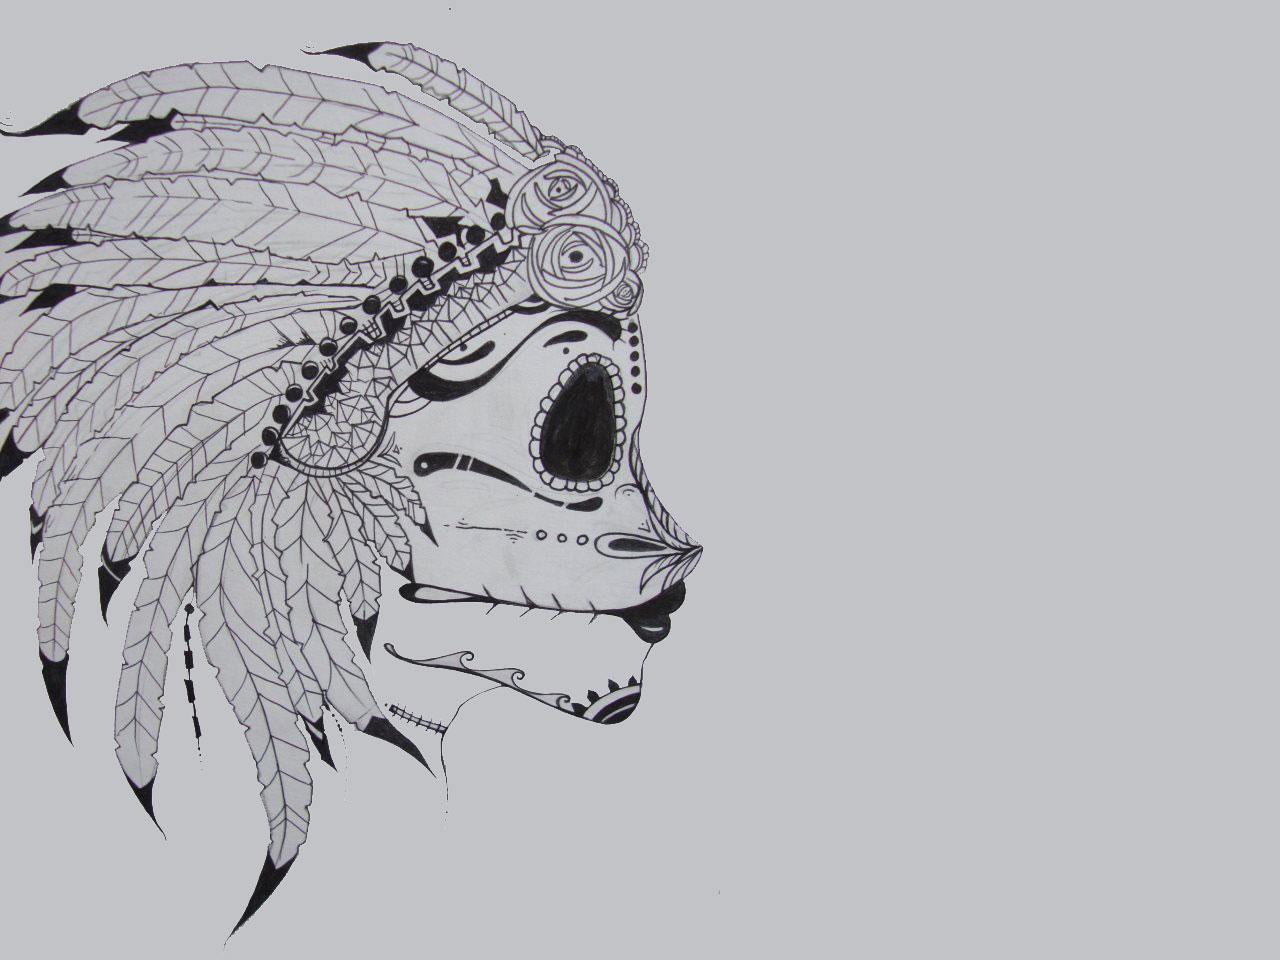 Red Indian Tribal Tattoo design wallpapers   Tattoo Design Ideas 1280x960